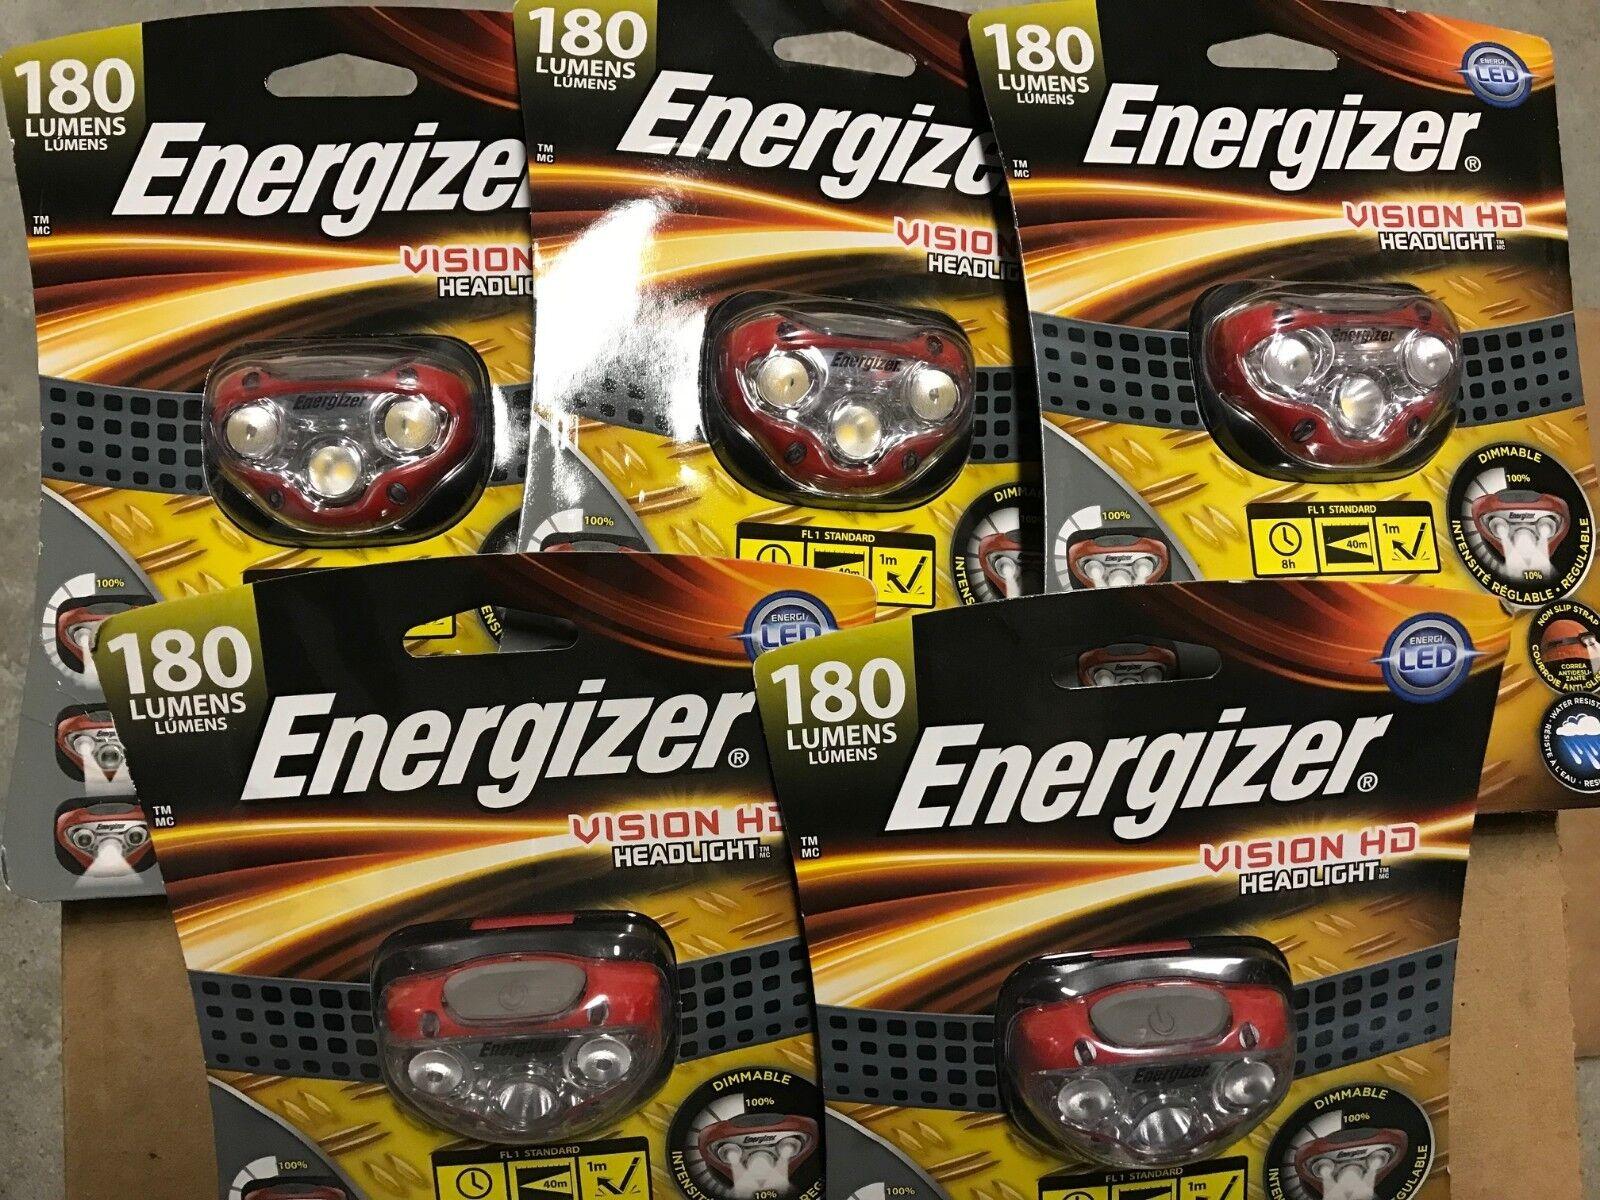 ENERGIZER 180 LU Herren VISION HEADLIGHTS HD HEADLIGHT INDUSTRIAL LOT OF 5 HEADLIGHTS VISION 15dccf